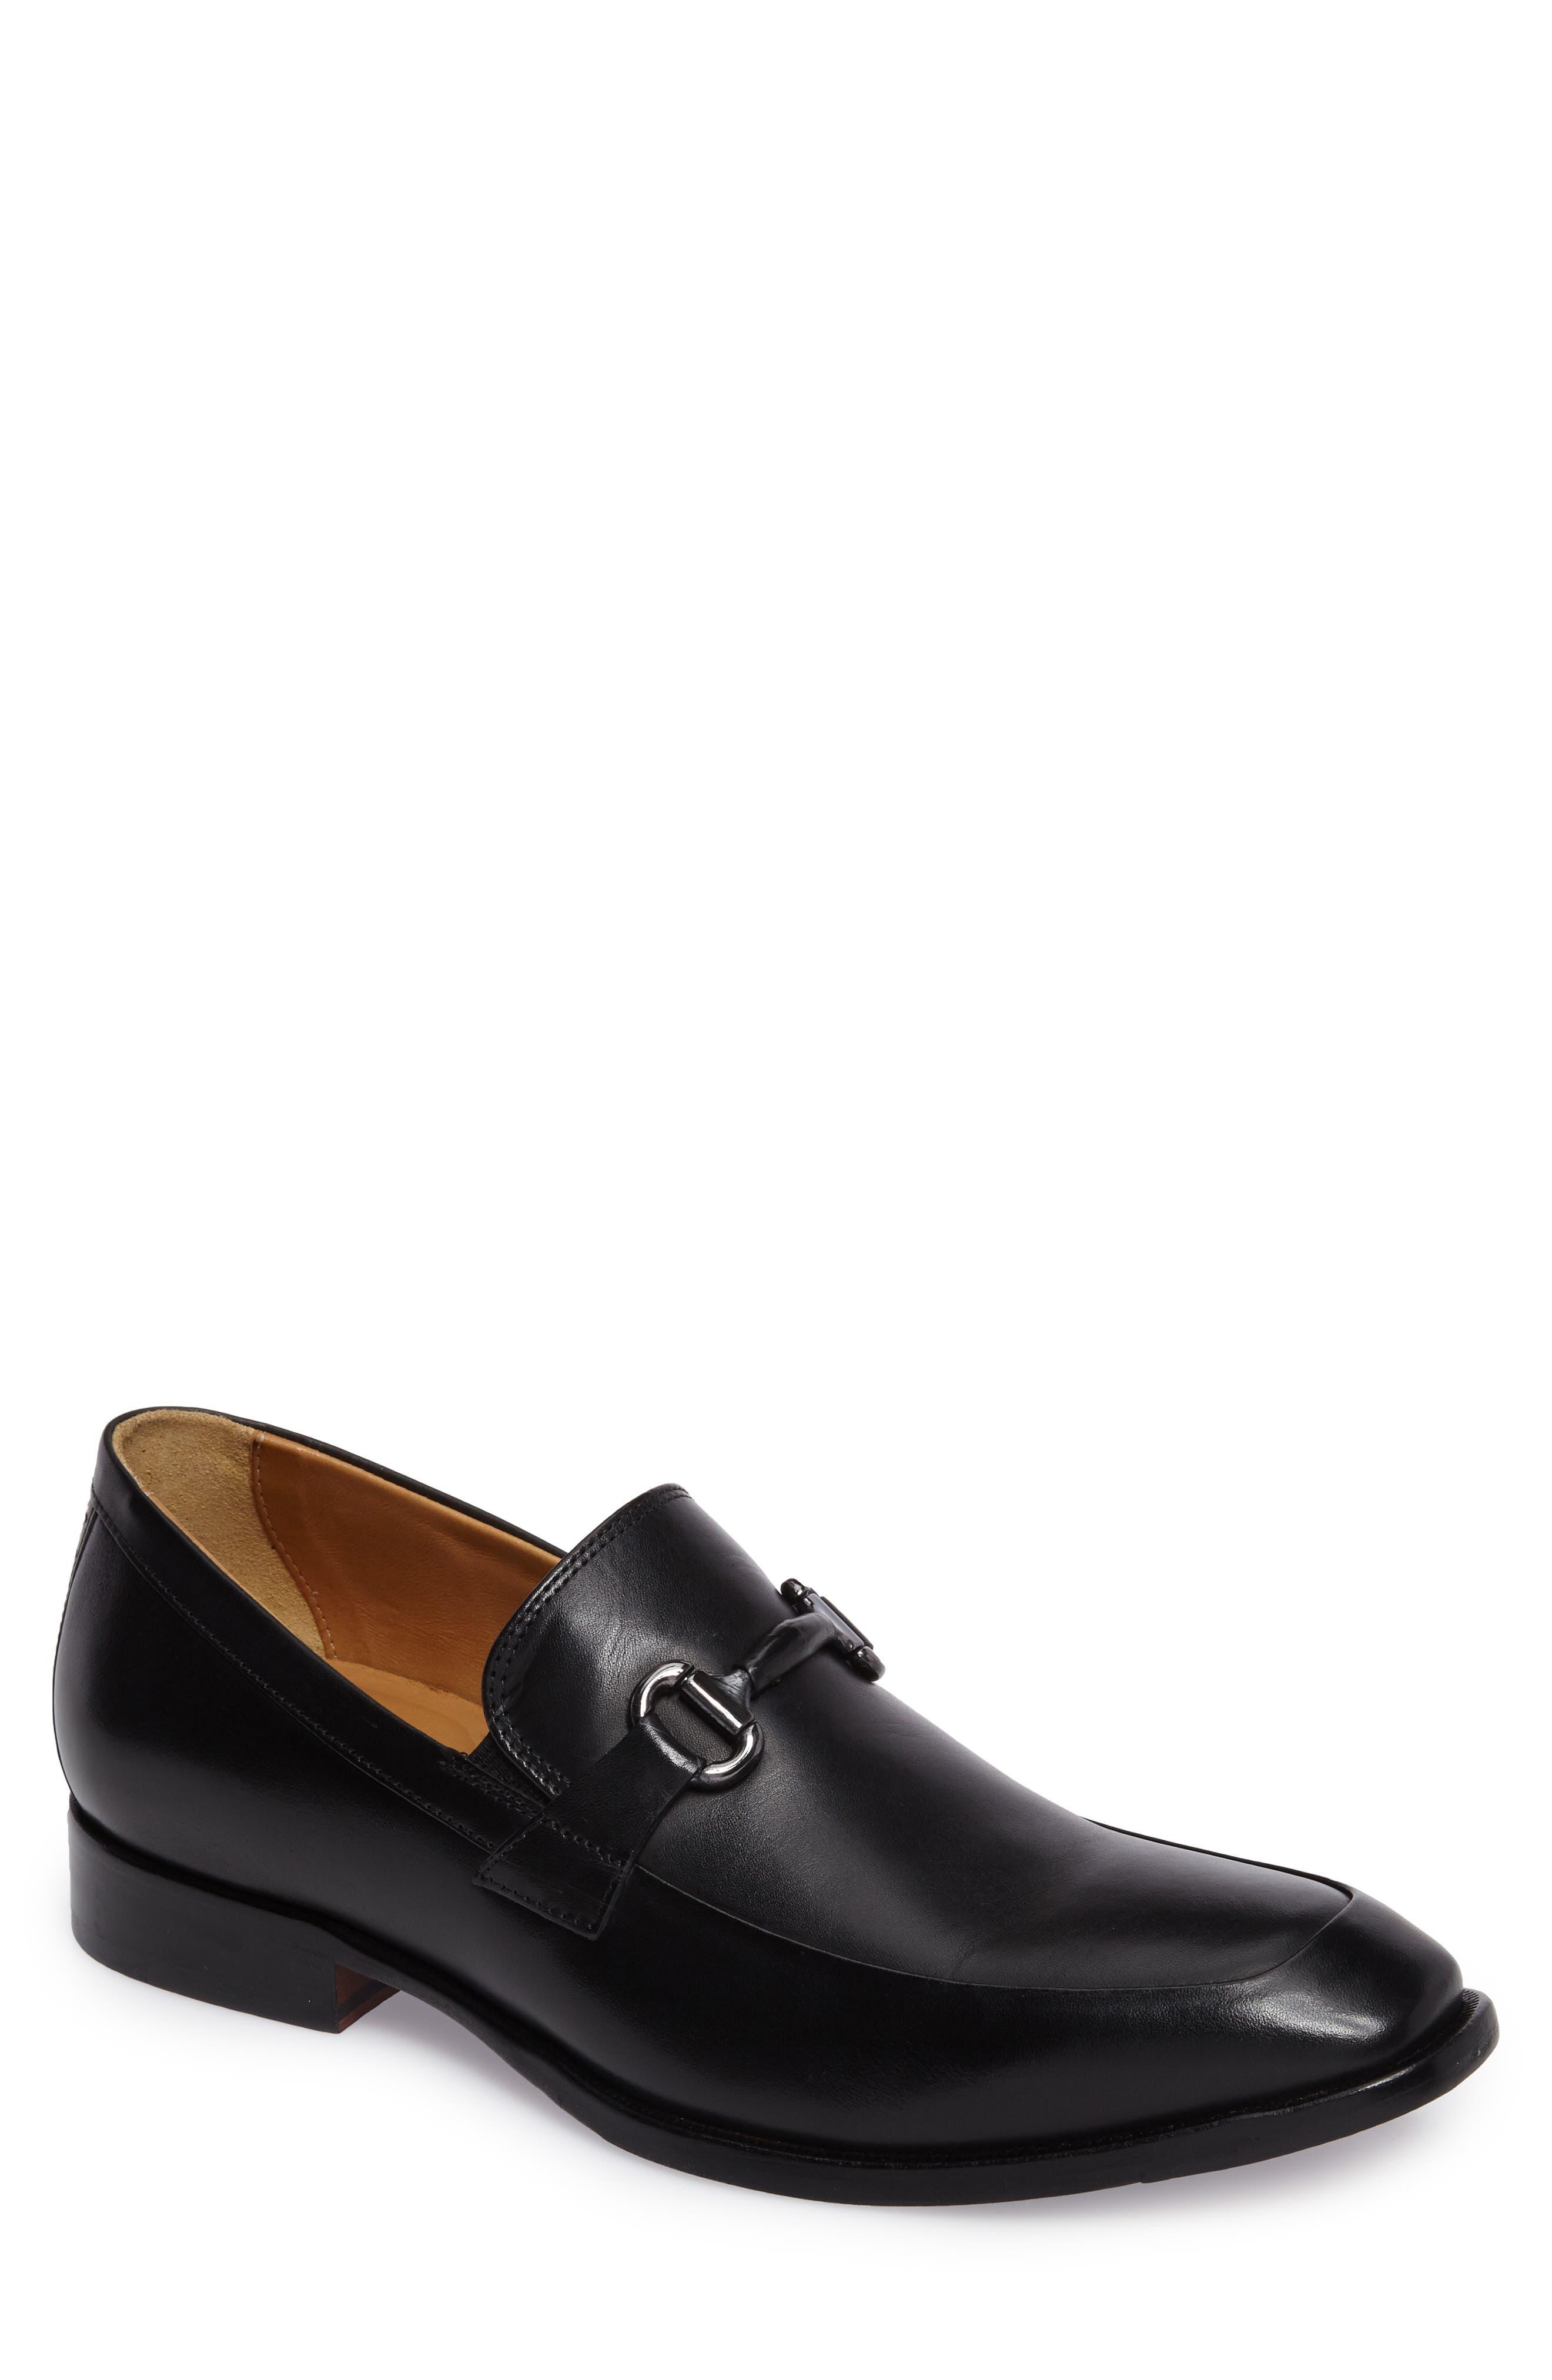 JOHNSTON & MURPHY McClain Bit Loafer, Main, color, BLACK